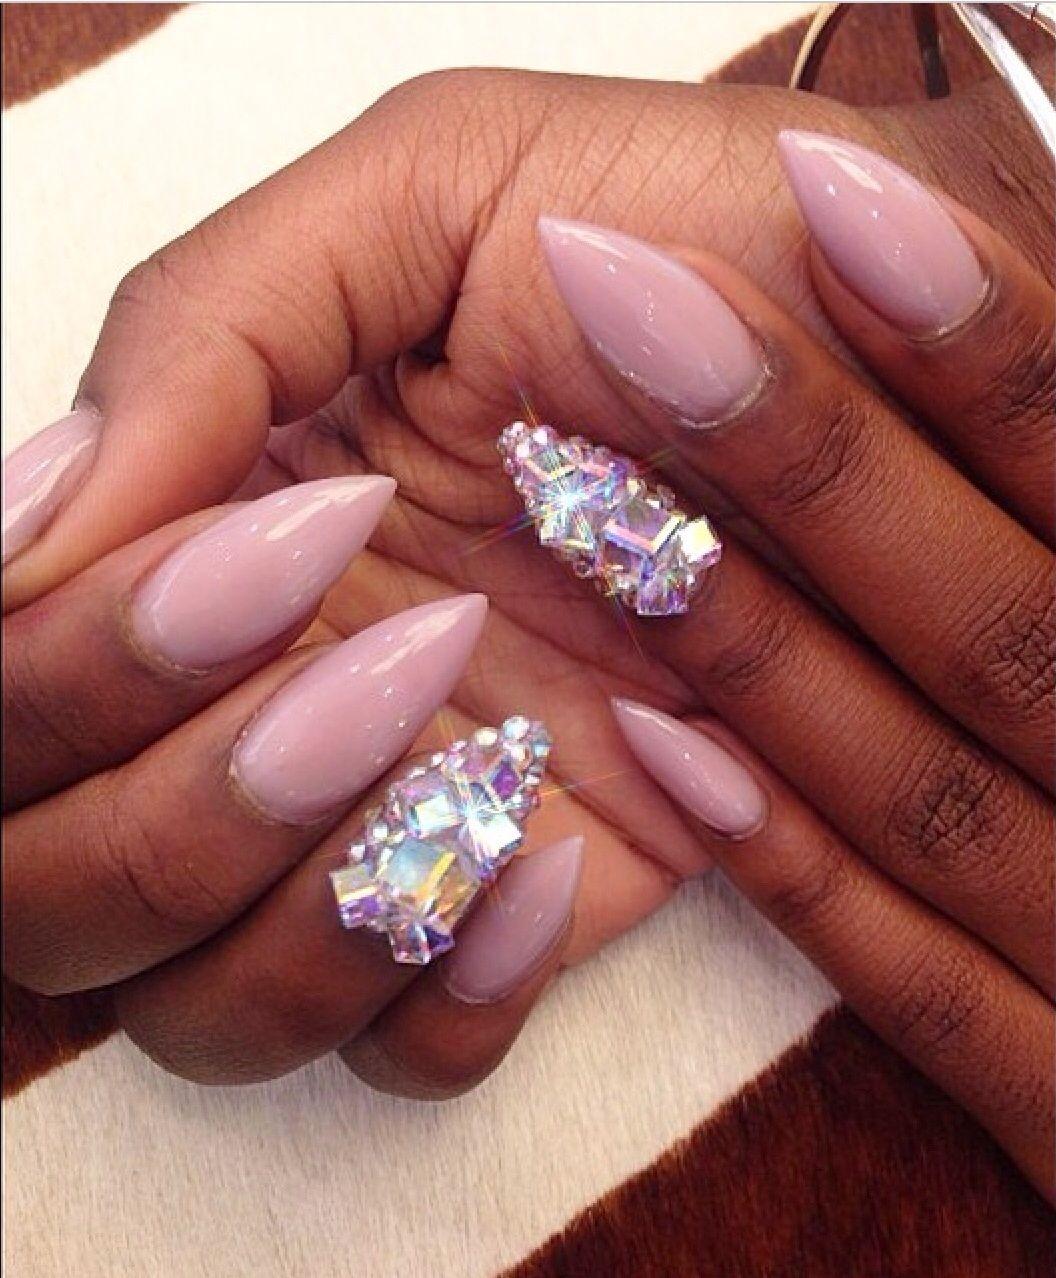 Pink stiletto nails with diamonds | Nails × | Pinterest